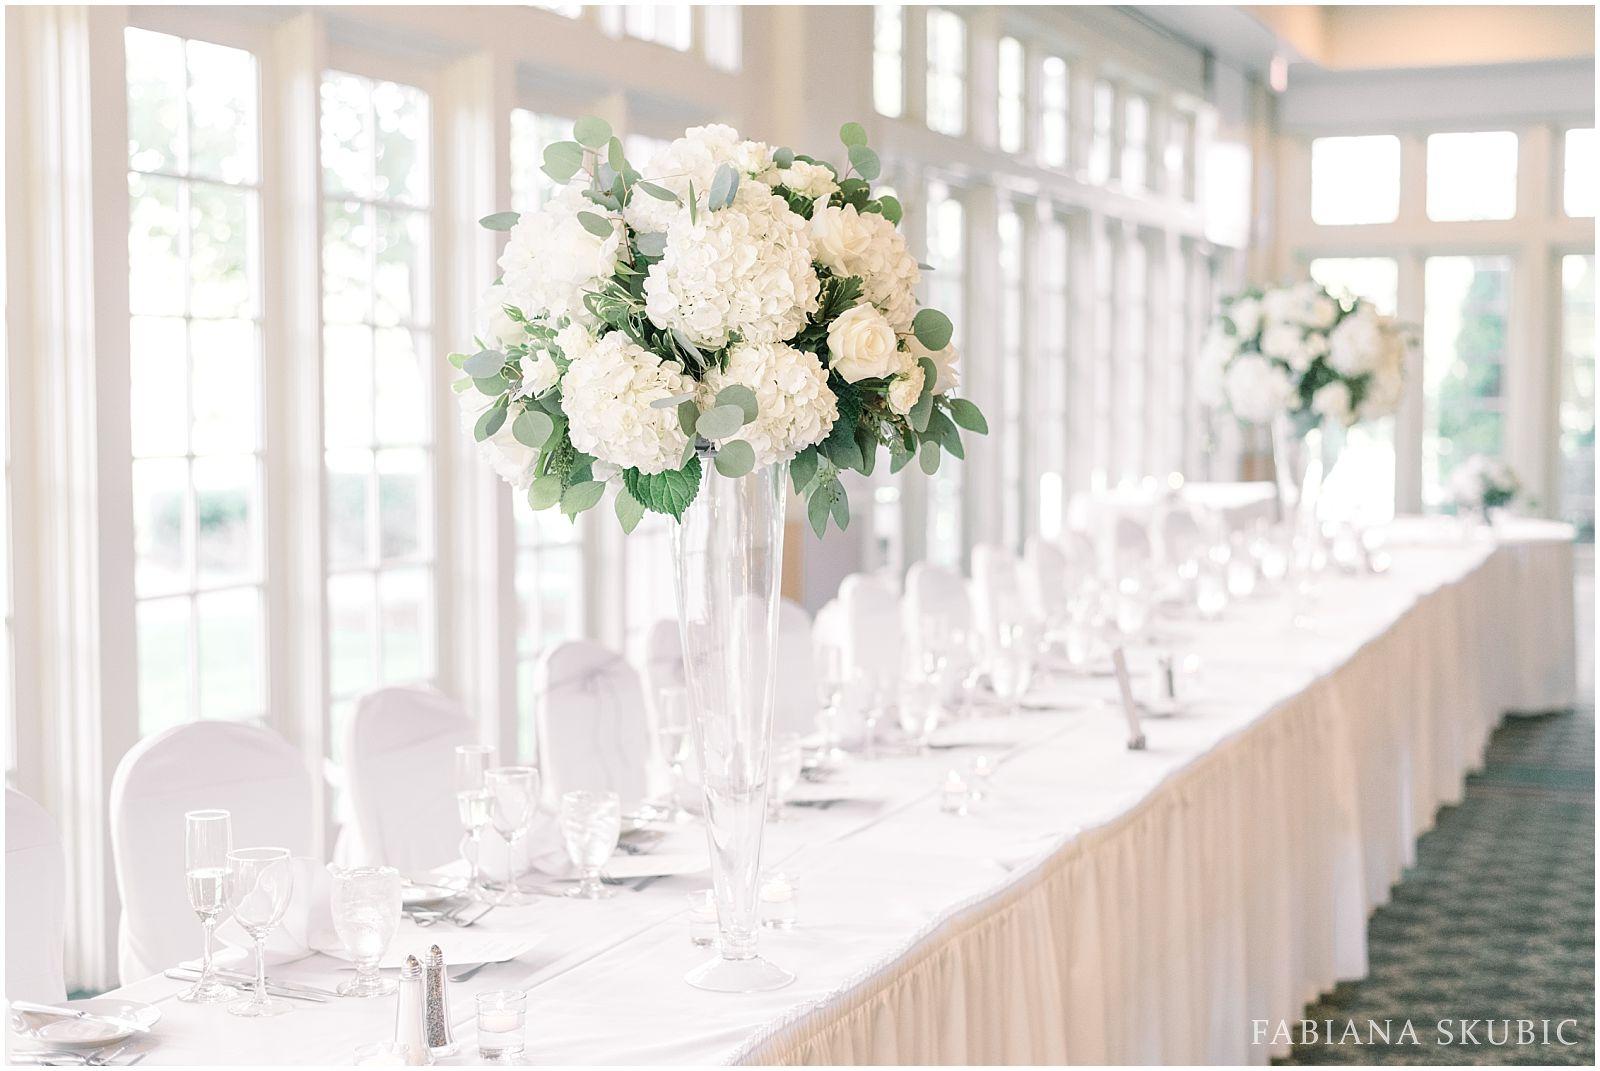 FabianaSkubic_H&M_Wedding_0052.jpg